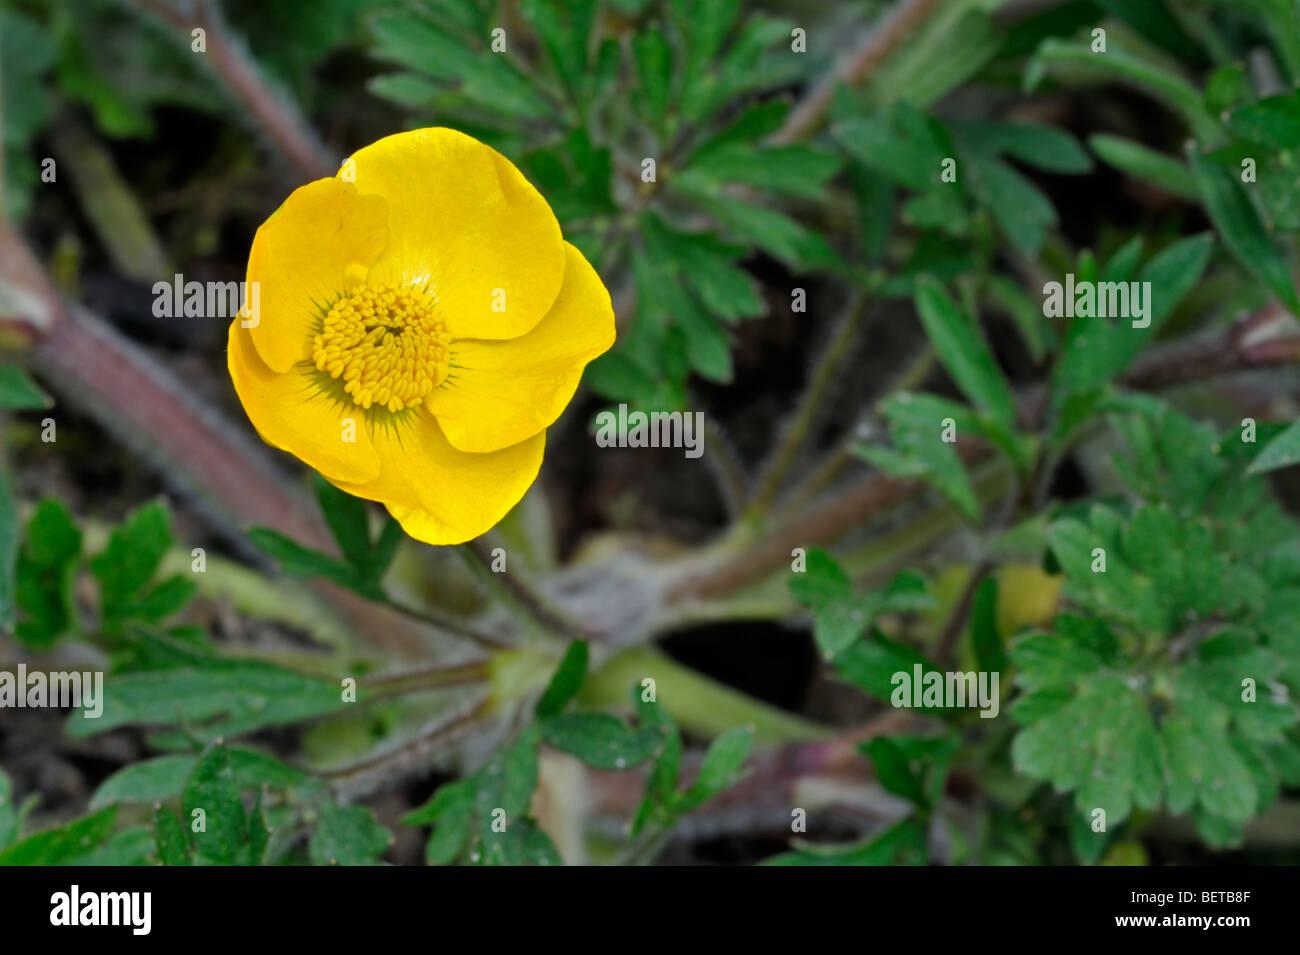 Bulbous buttercup / Saint Anthony's turnip (Ranunculus bulbosus) flowering in grassland - Stock Image